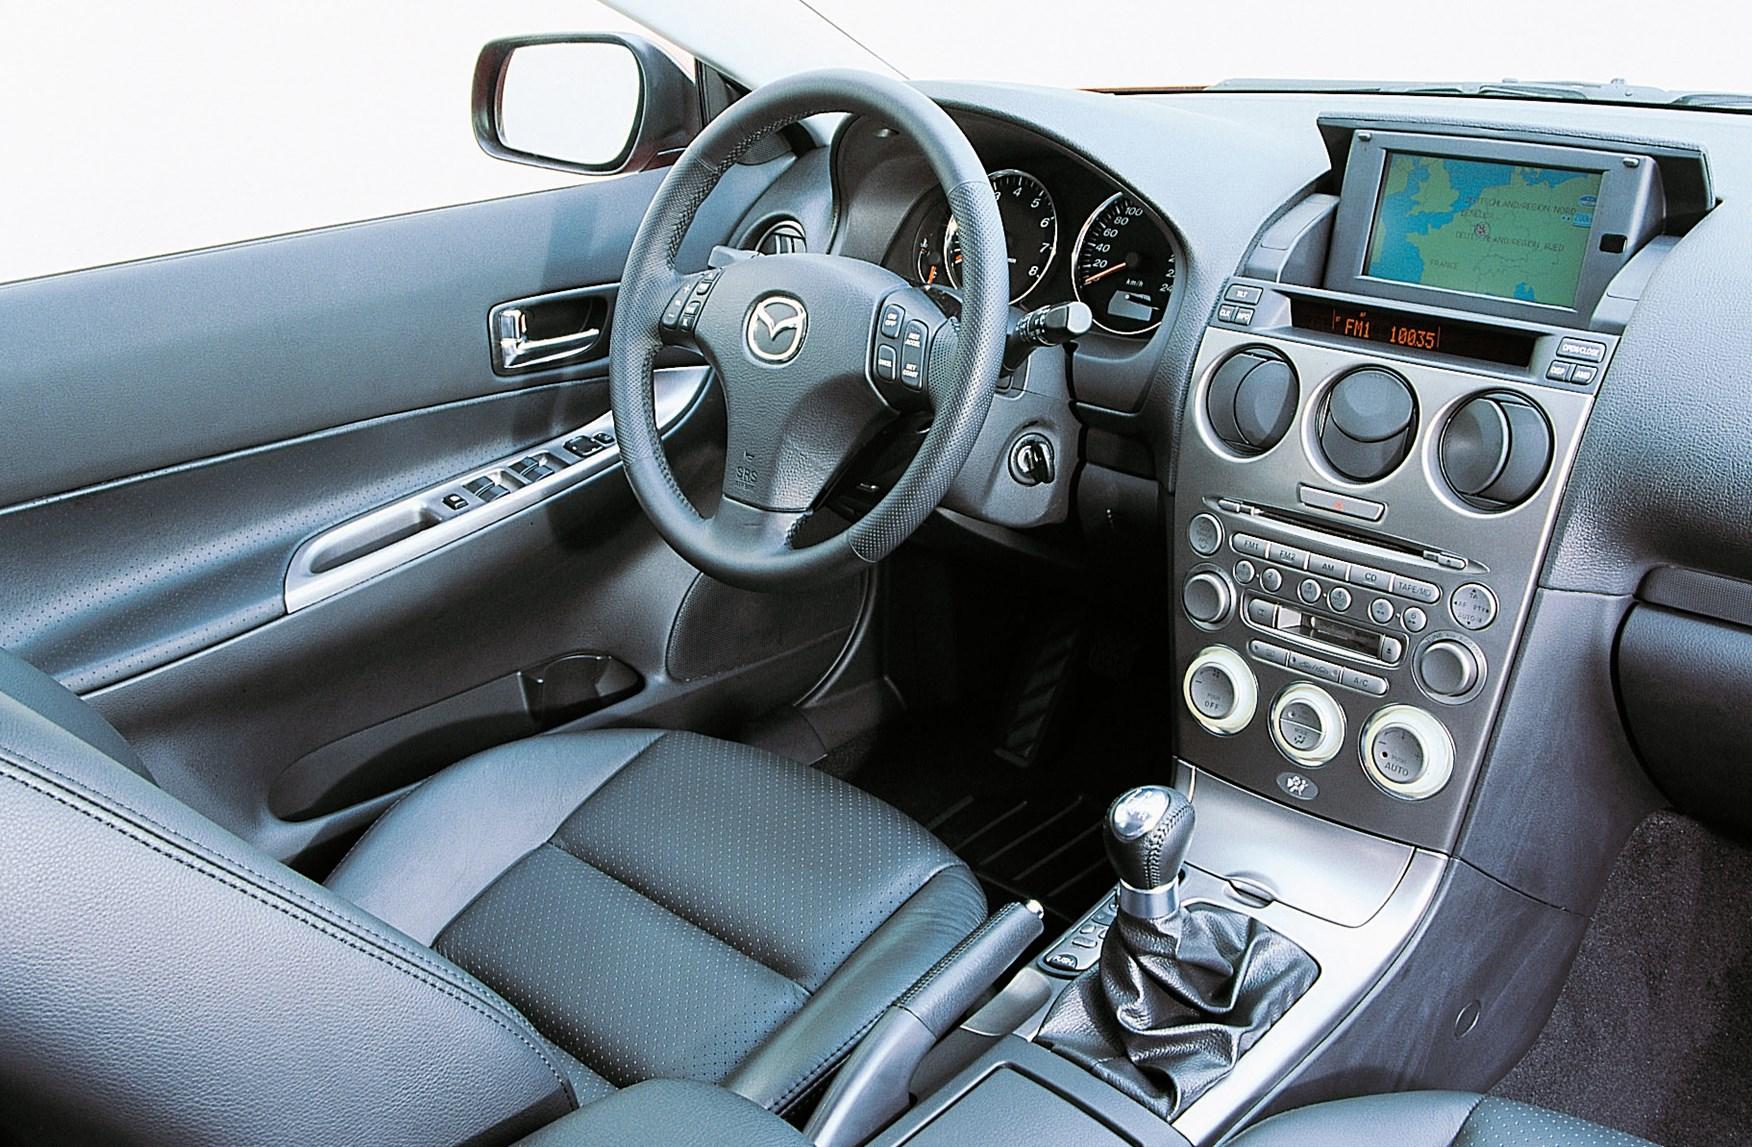 mazda 6 2004 interior. behind the wheel mazda 6 2004 interior